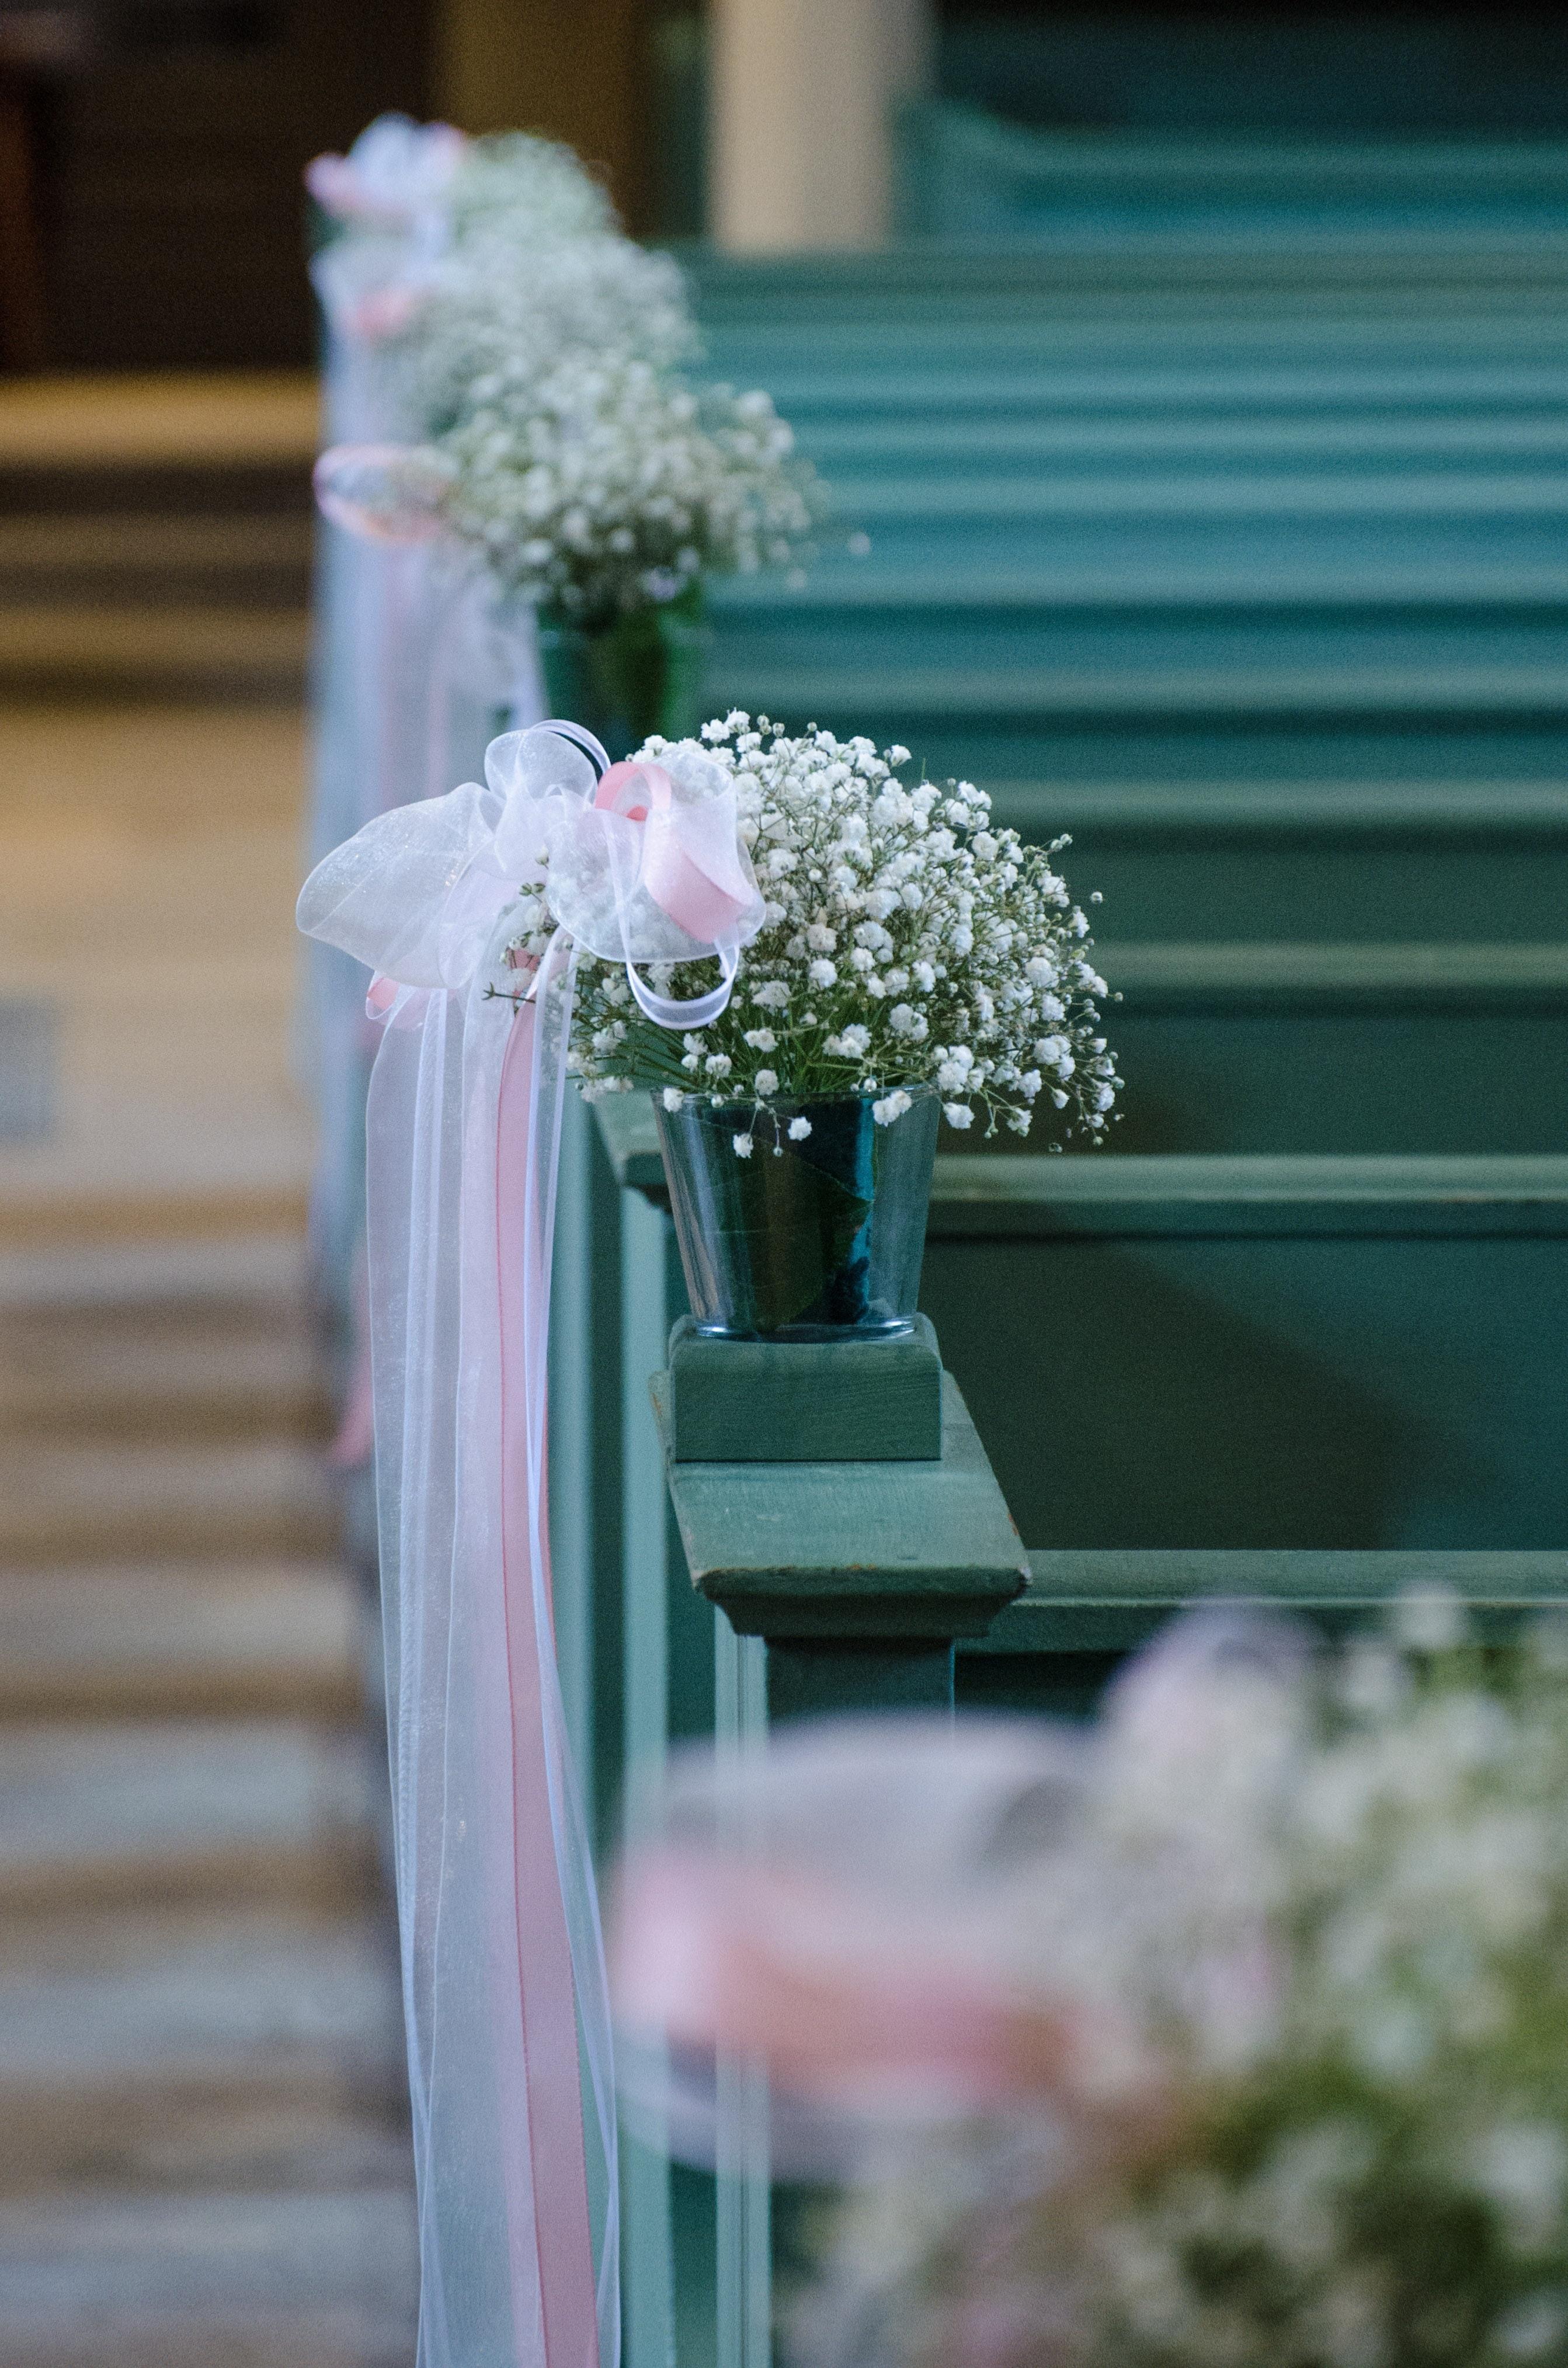 bloom-blossom-blur-265836